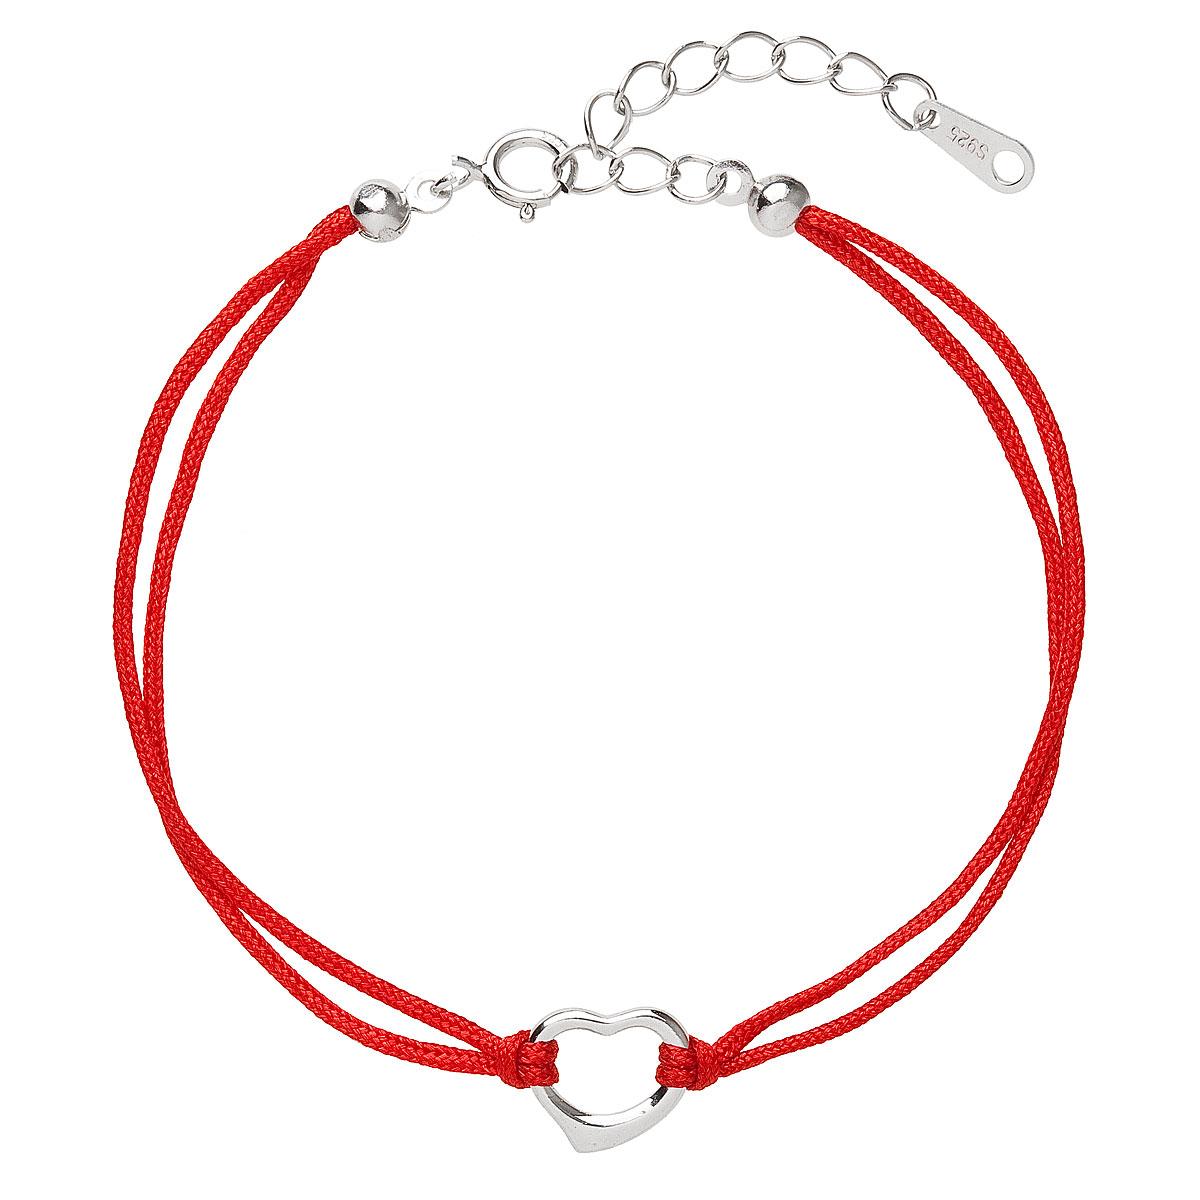 Červený náramek proti uhranutí stříbrné srdíčko EG7237-R